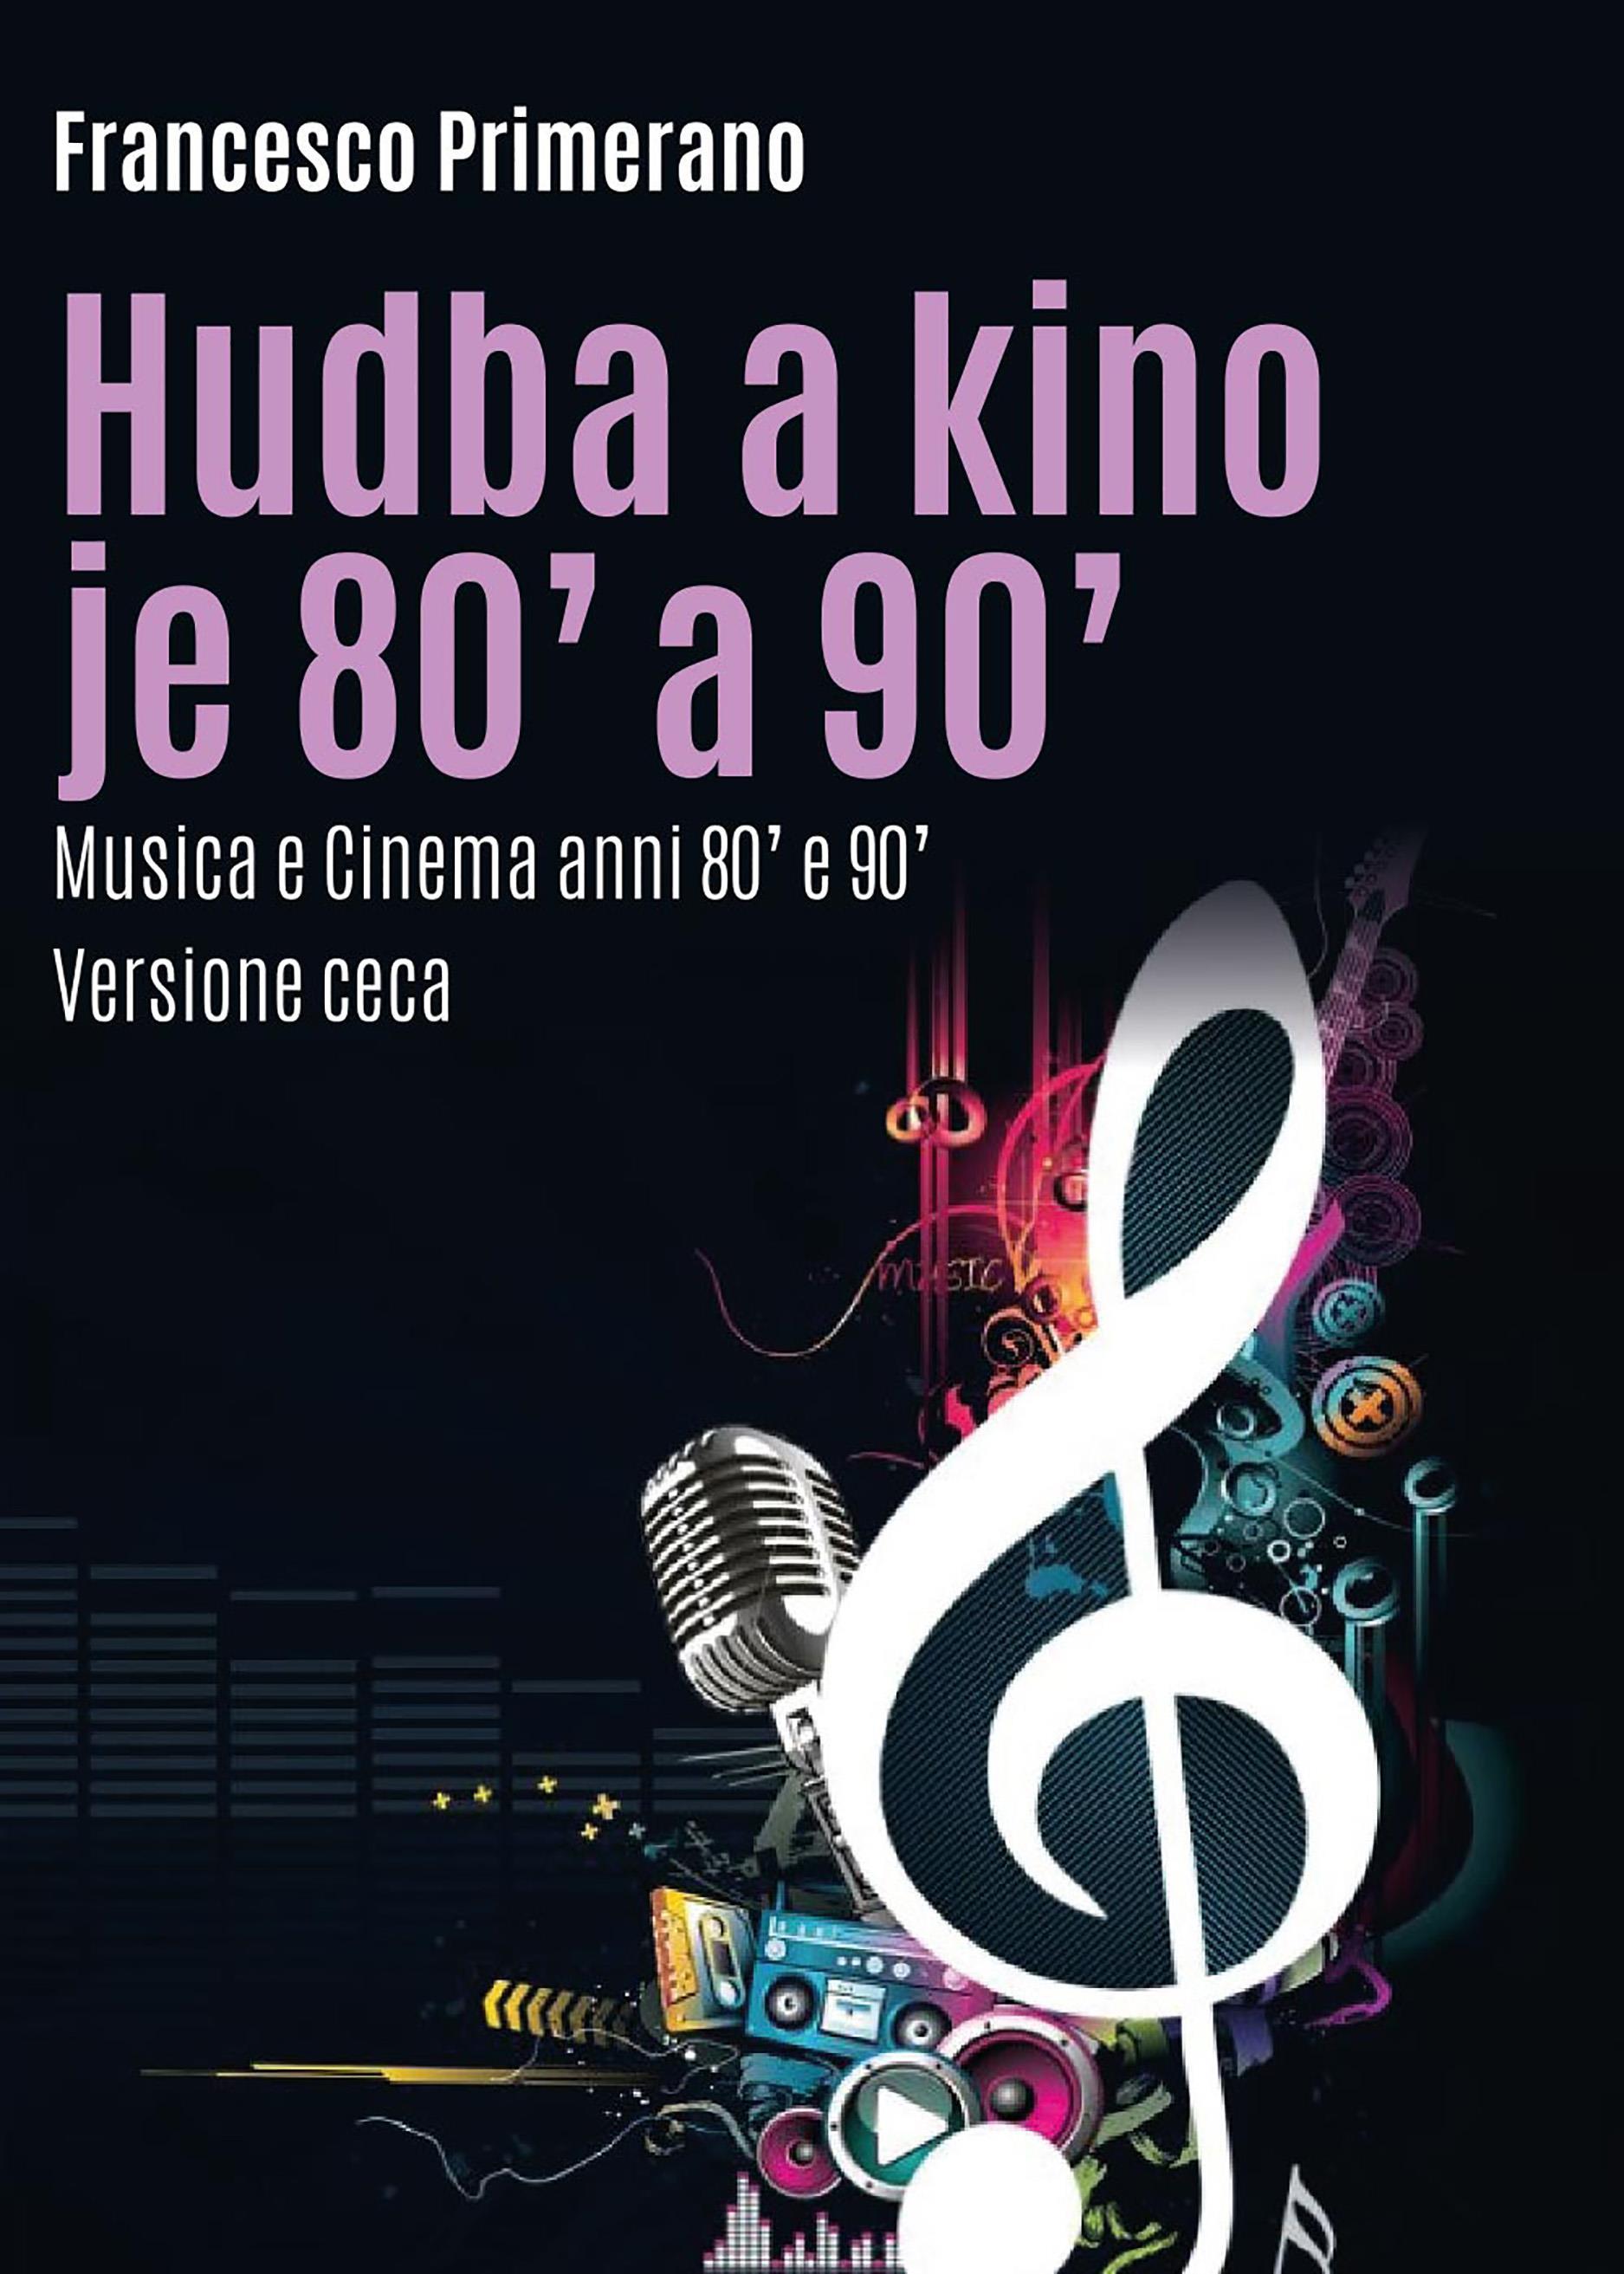 Hudba a kino je 80' a 90'